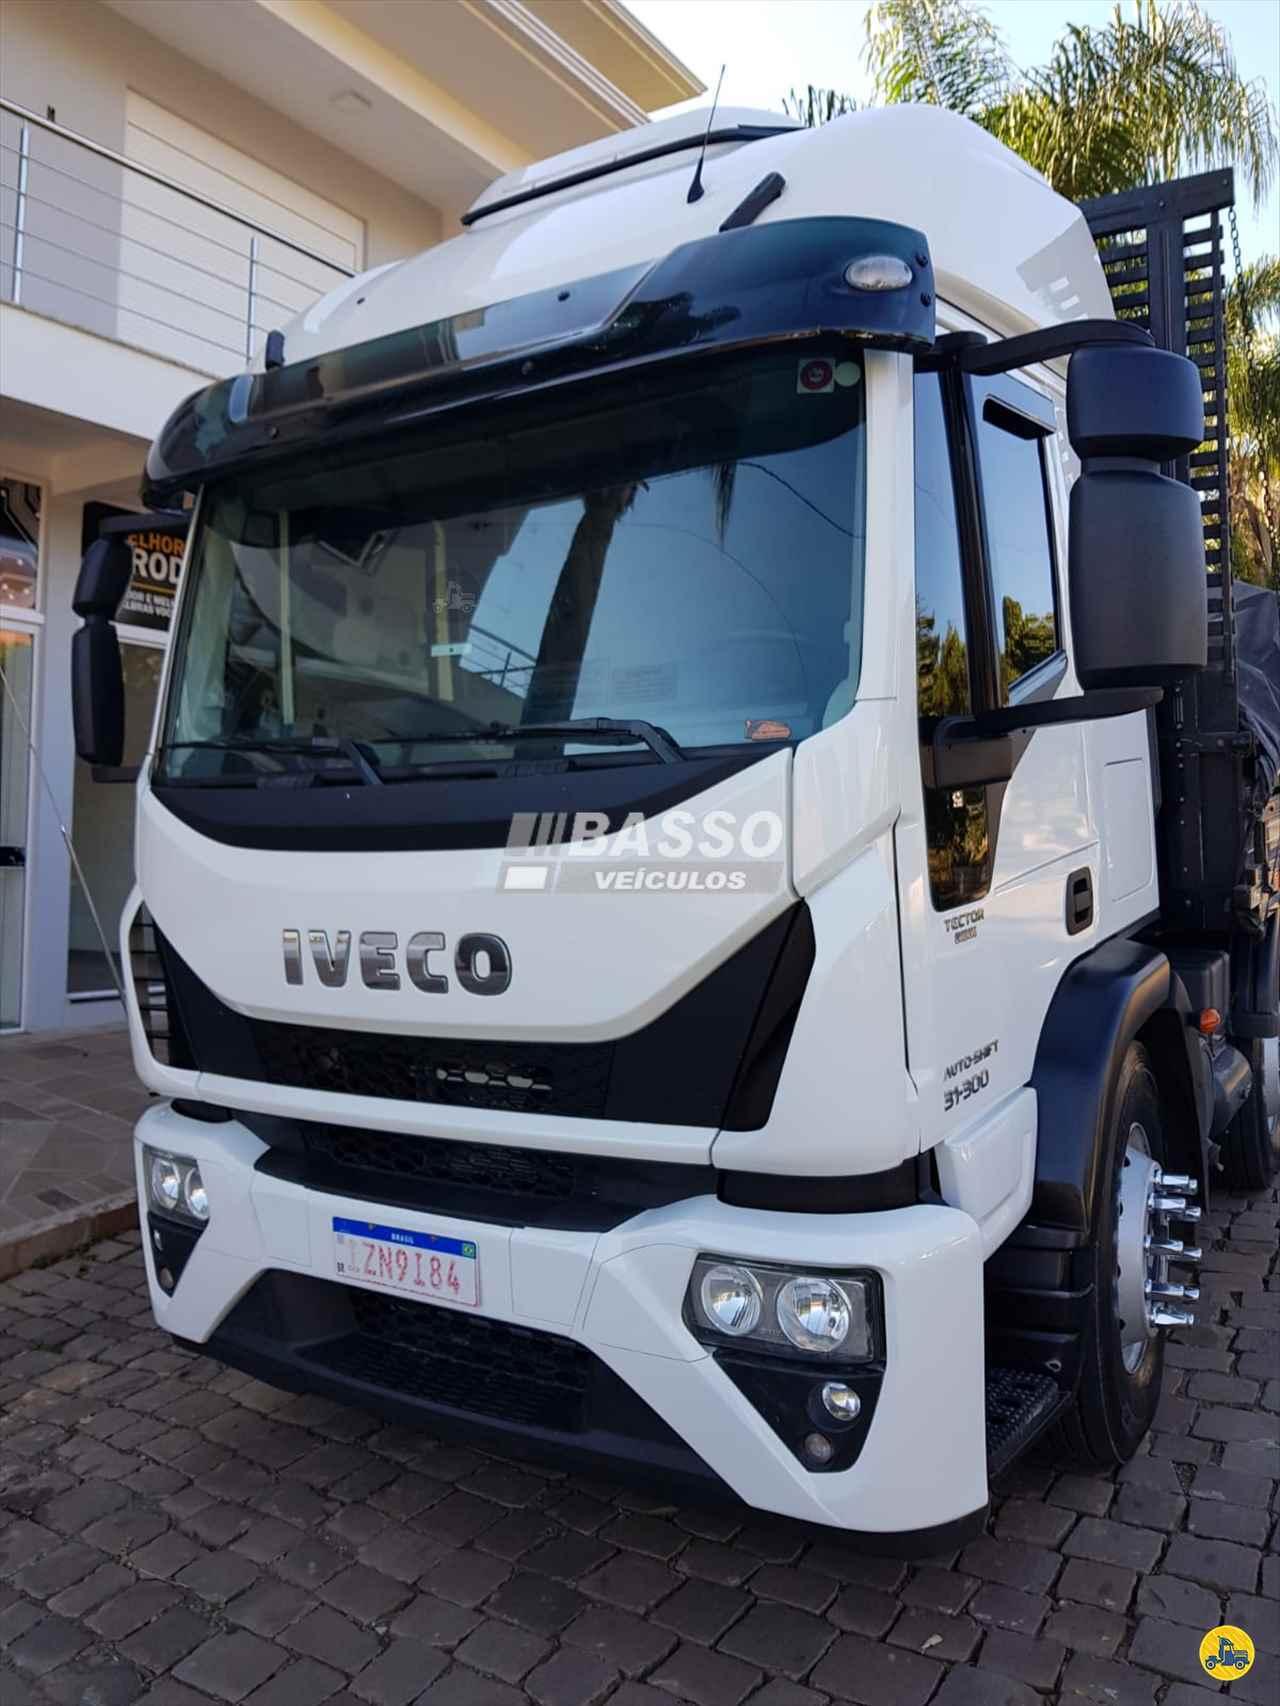 CAMINHAO IVECO TECTOR 310E30 Carga Seca BiTruck 8x2 Basso Veículos GARIBALDI RIO GRANDE DO SUL RS